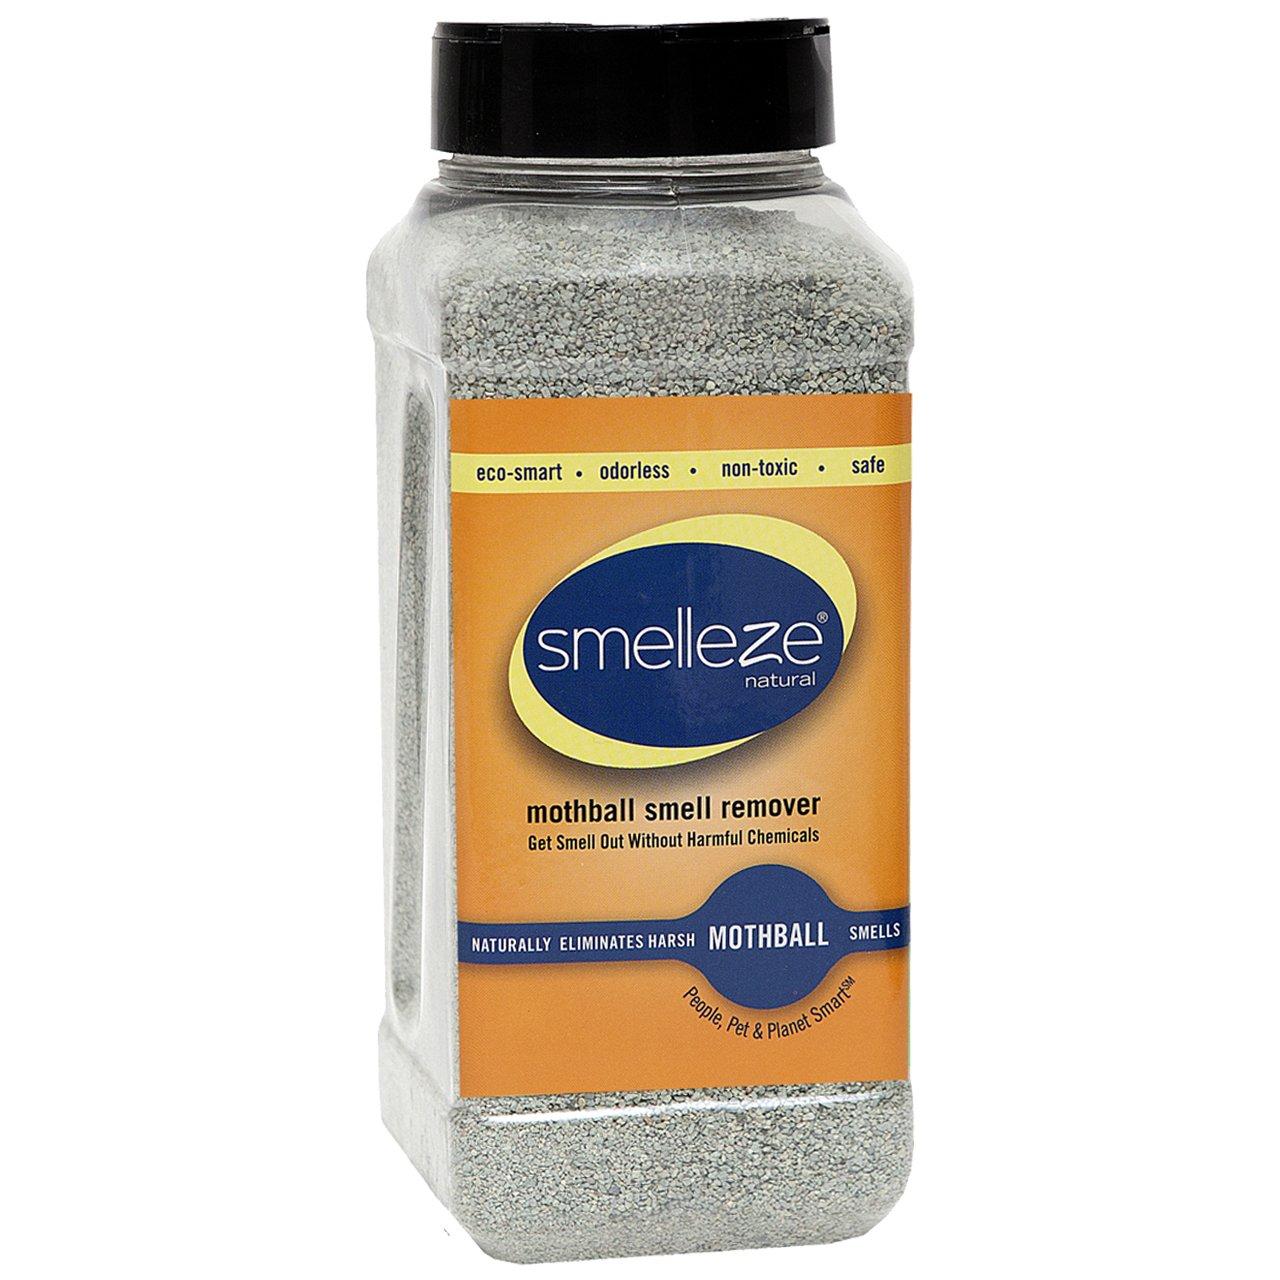 SMELLEZE Natural Moth Ball Odor Remover Deodorizer: 50 lb. Granules Rids Mothball Vapors by SMELLEZE